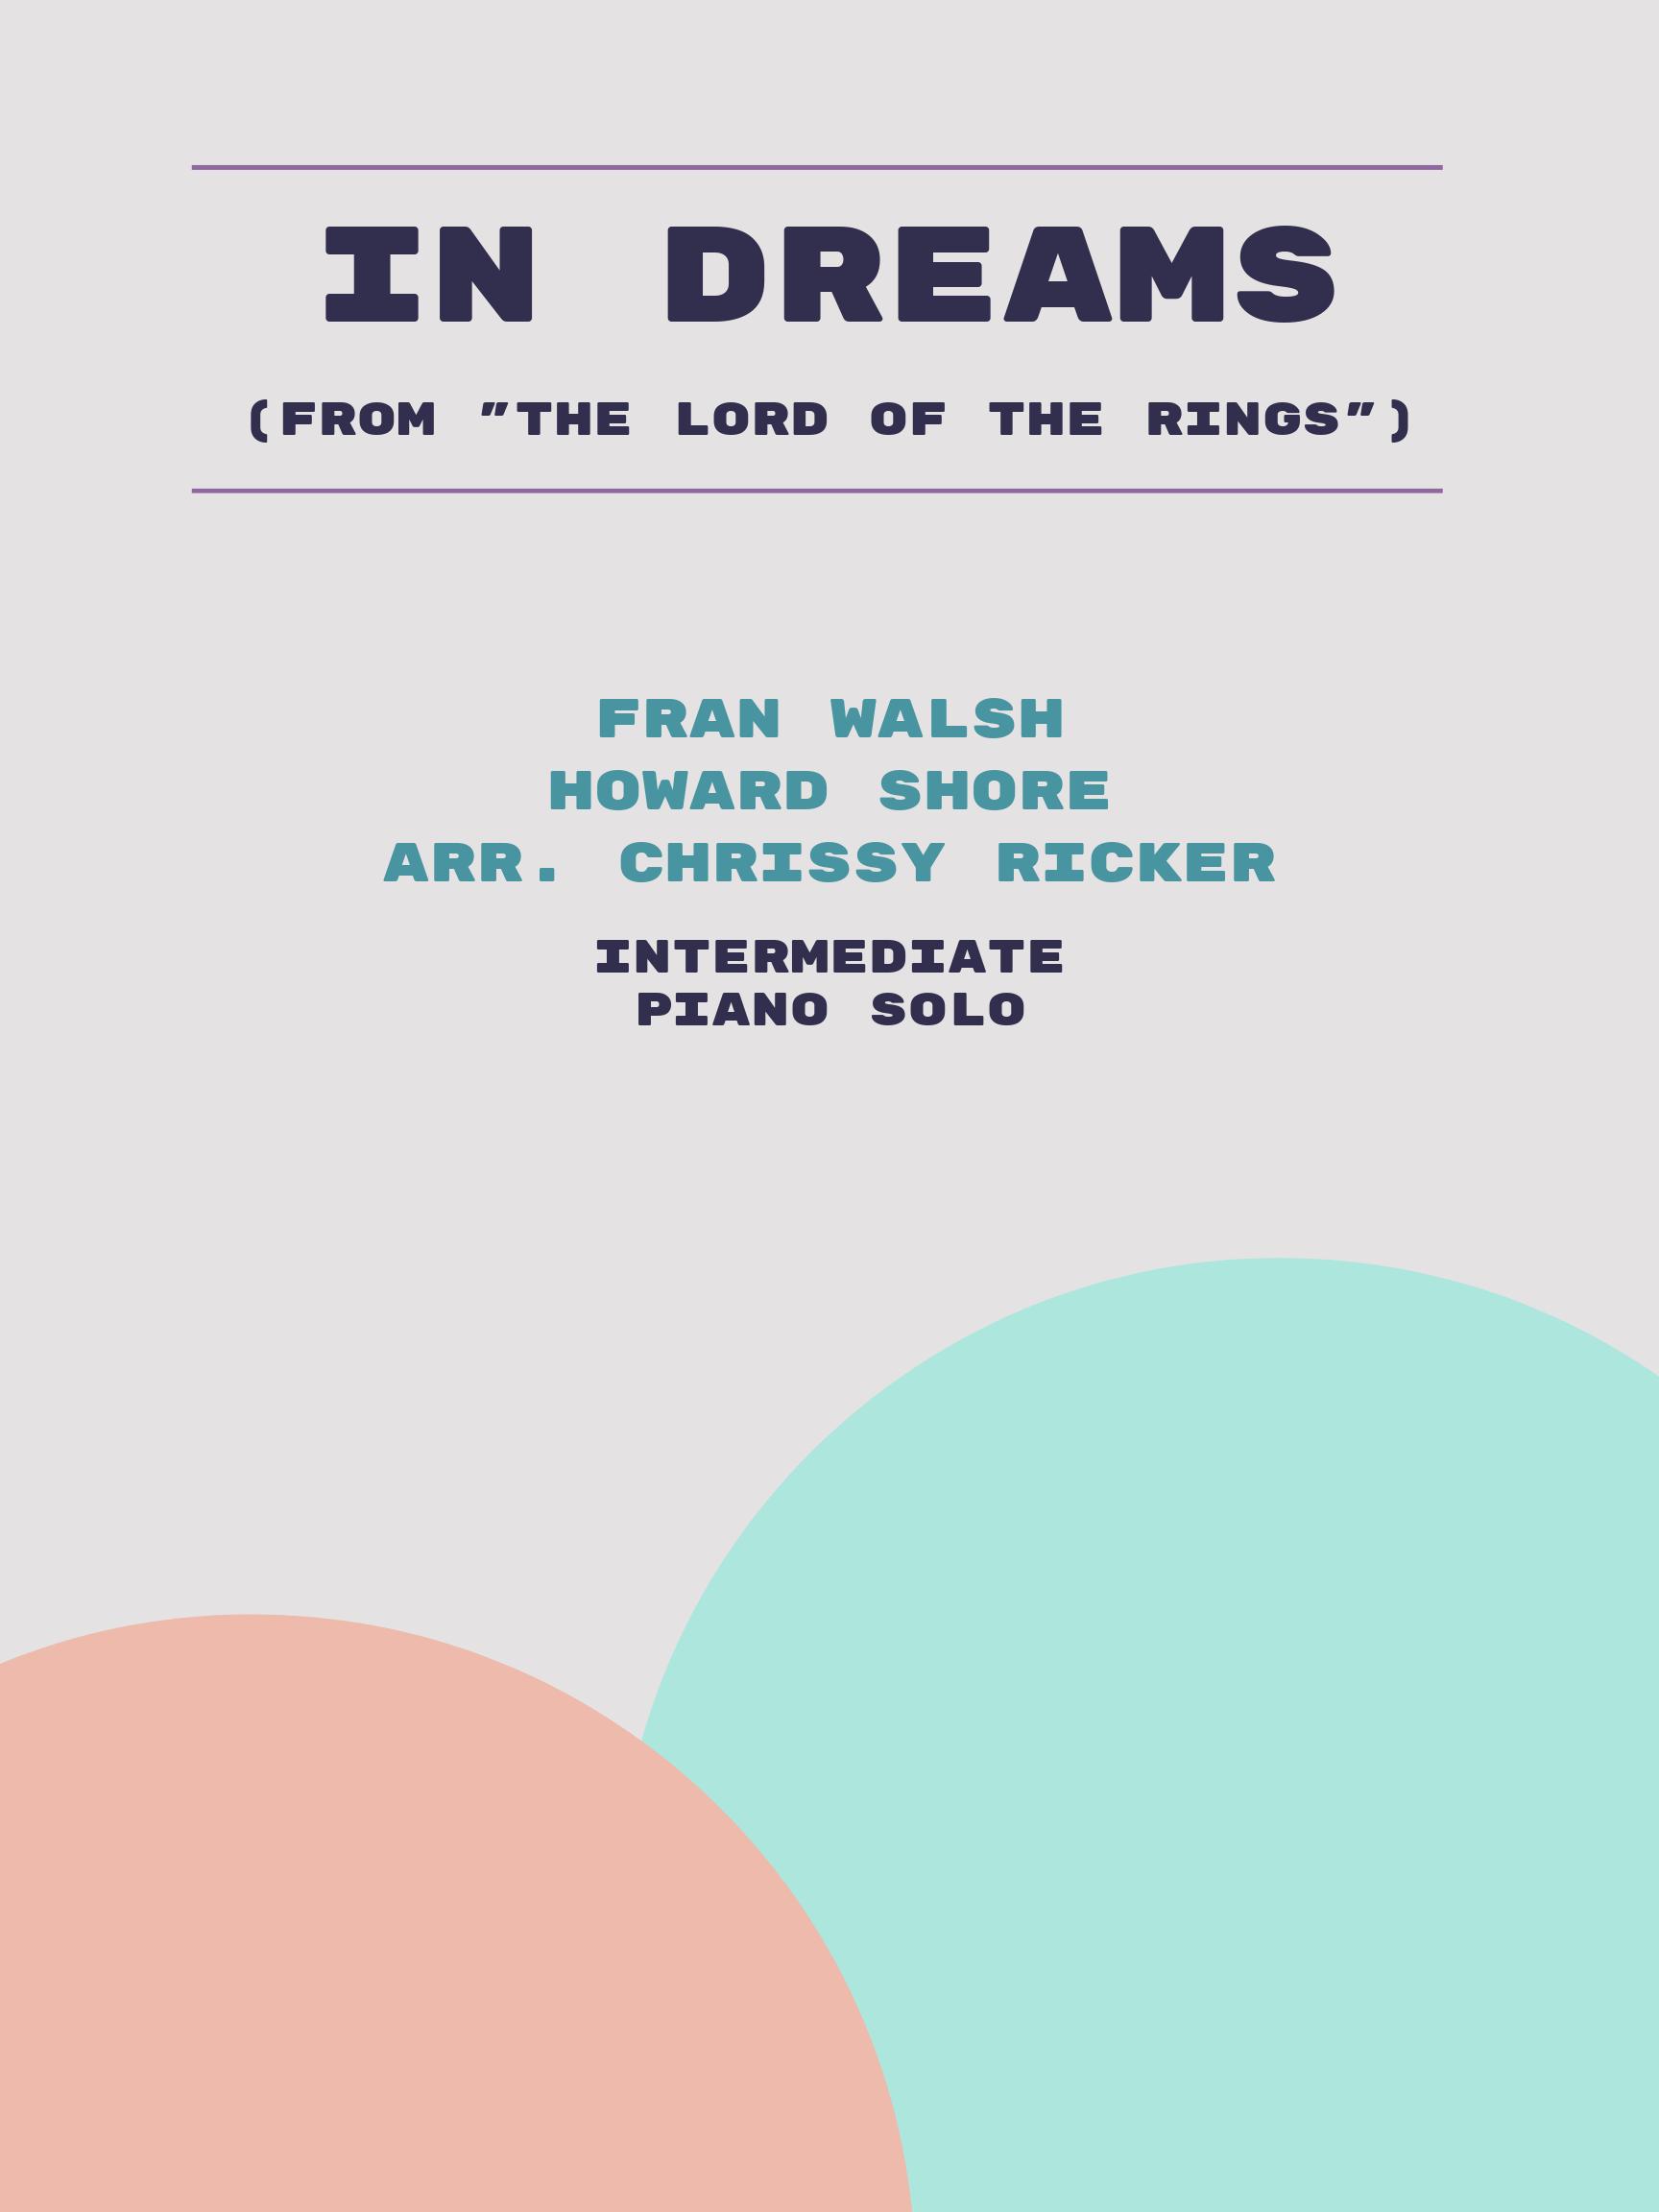 In Dreams by Fran Walsh, Howard Shore